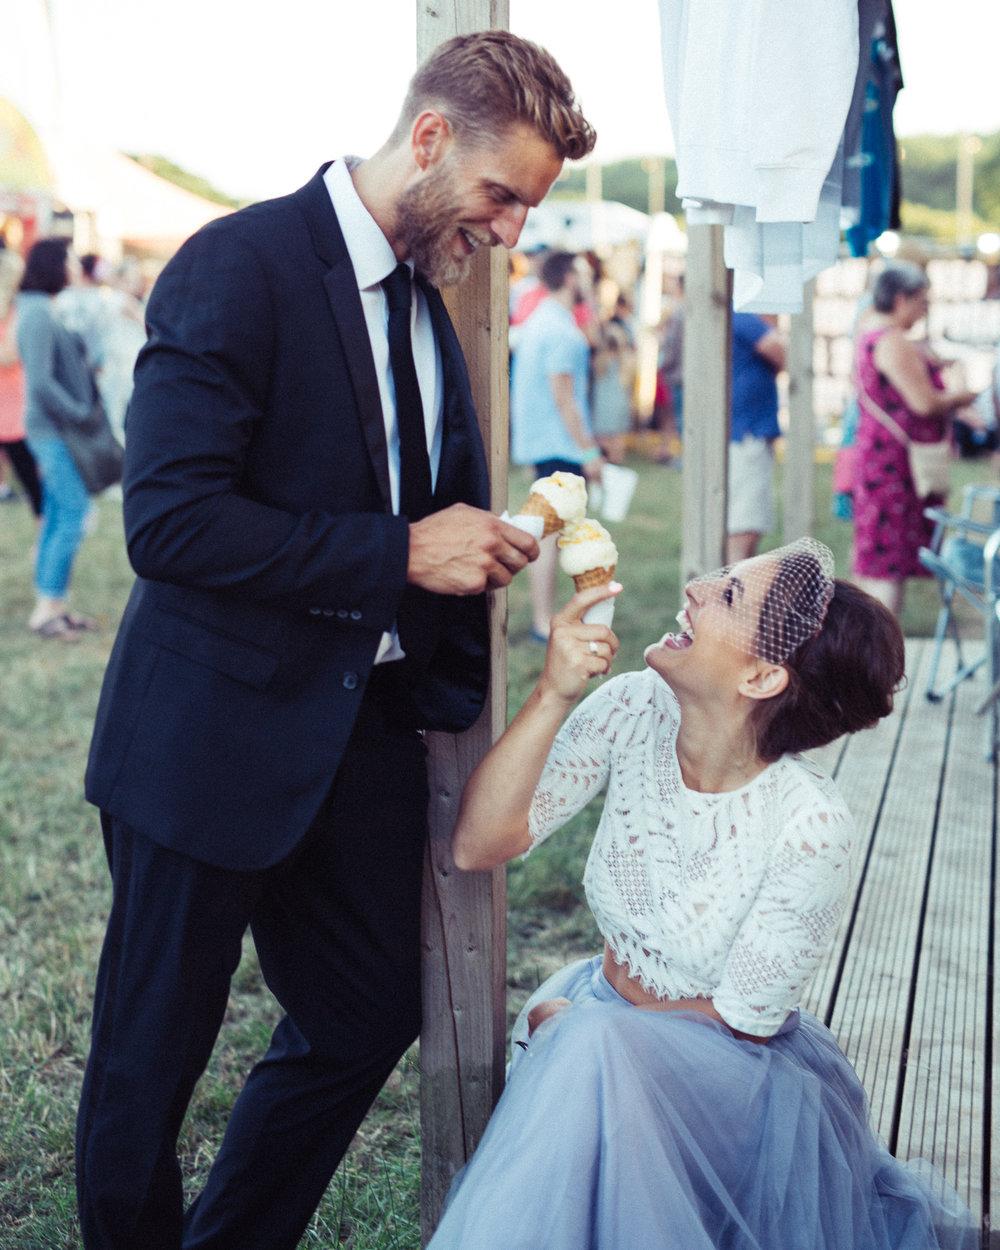 Weddings_In_The_Wyldes_Adj_Brown_icecream.jpg